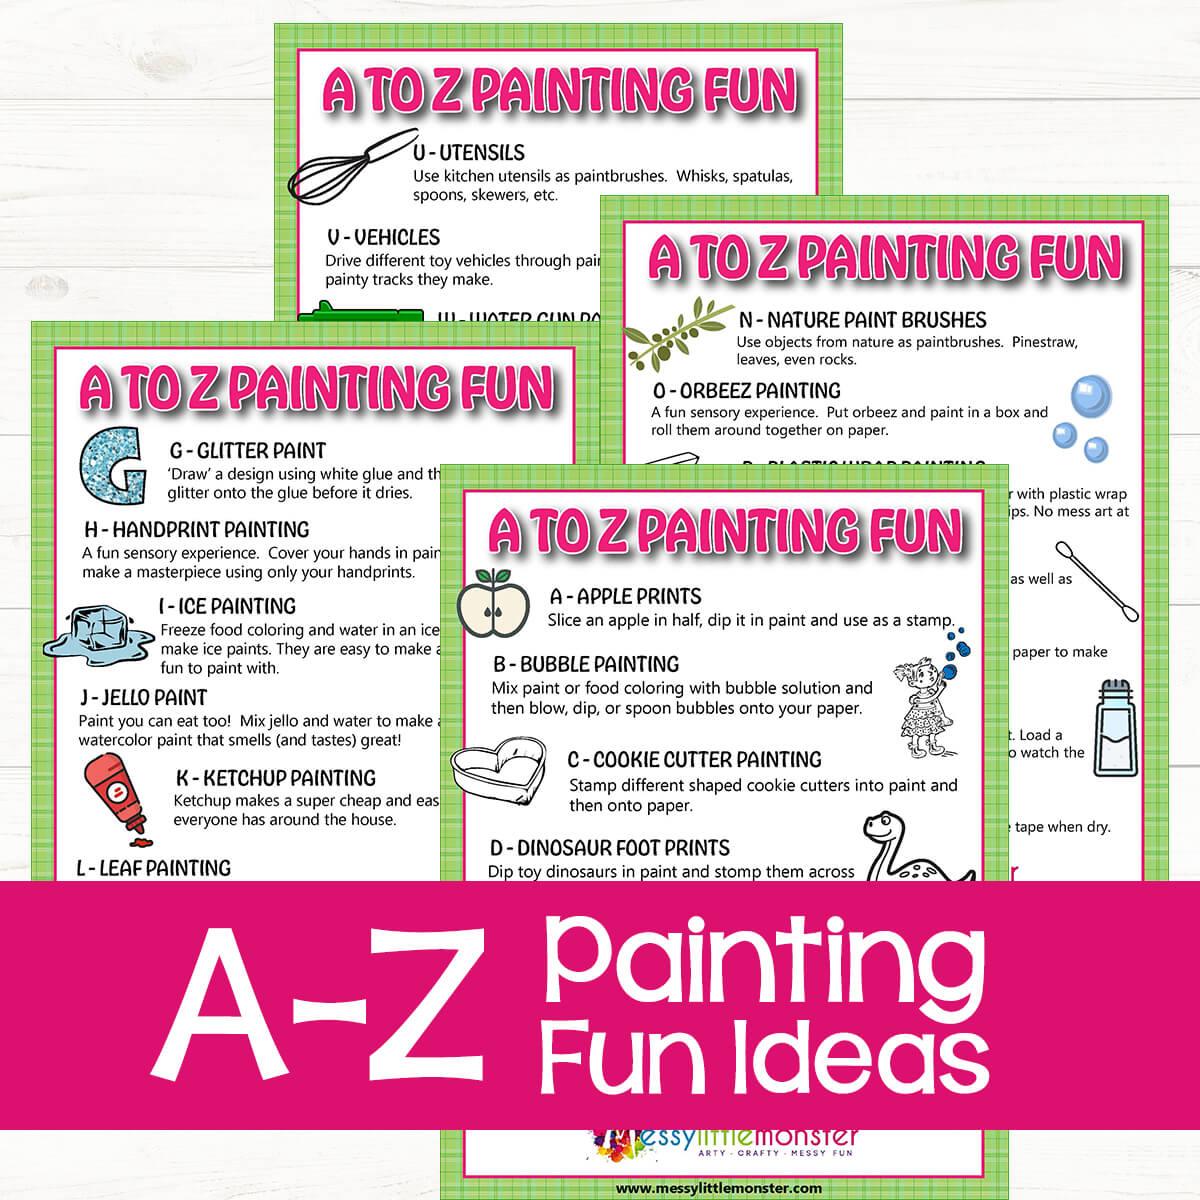 Preschool A-Z Painting Fun_Ideas